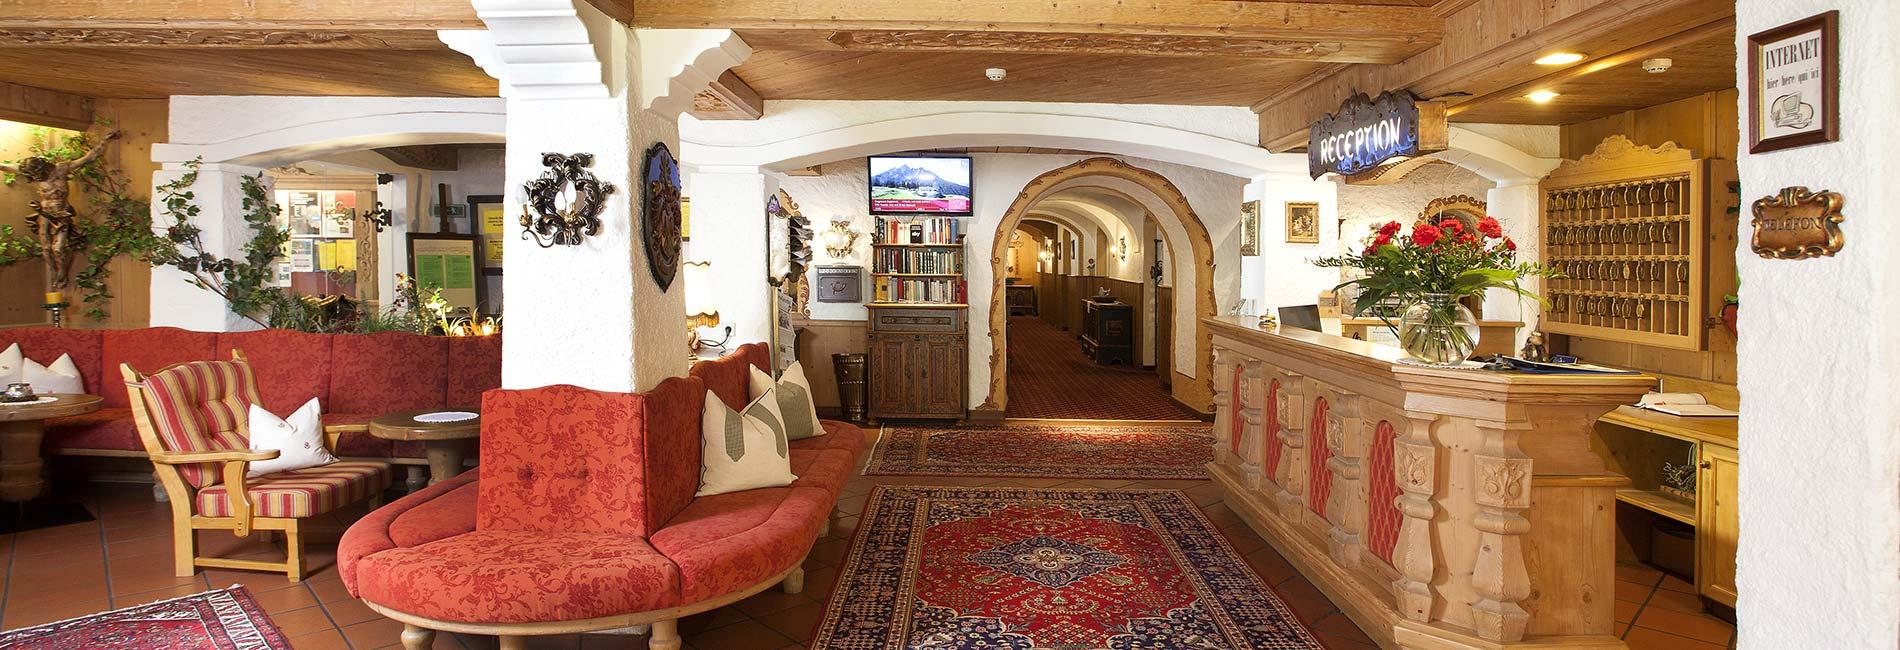 Hotel Almhof Urlaub im 4 Sterne Hotel in Neustift Milders Stubai Tirol